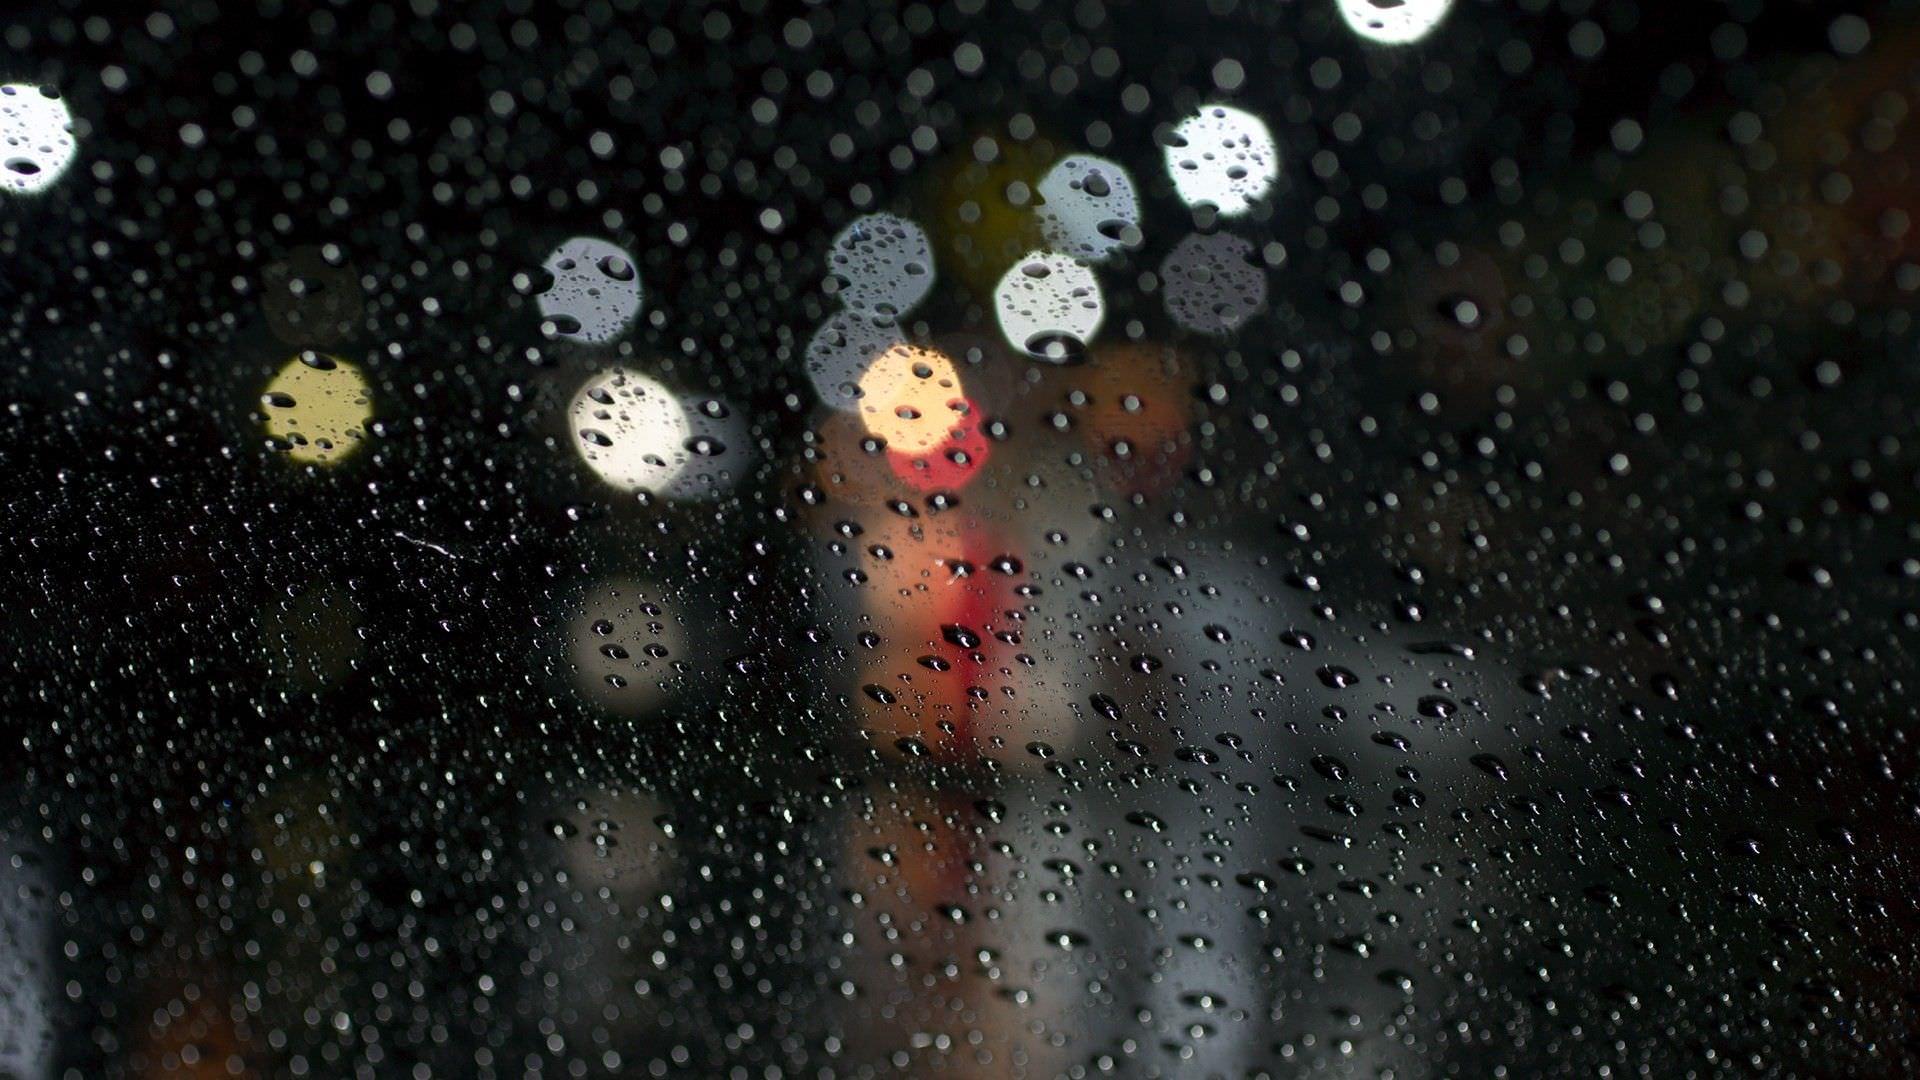 Water drops On Glass Wallpaper